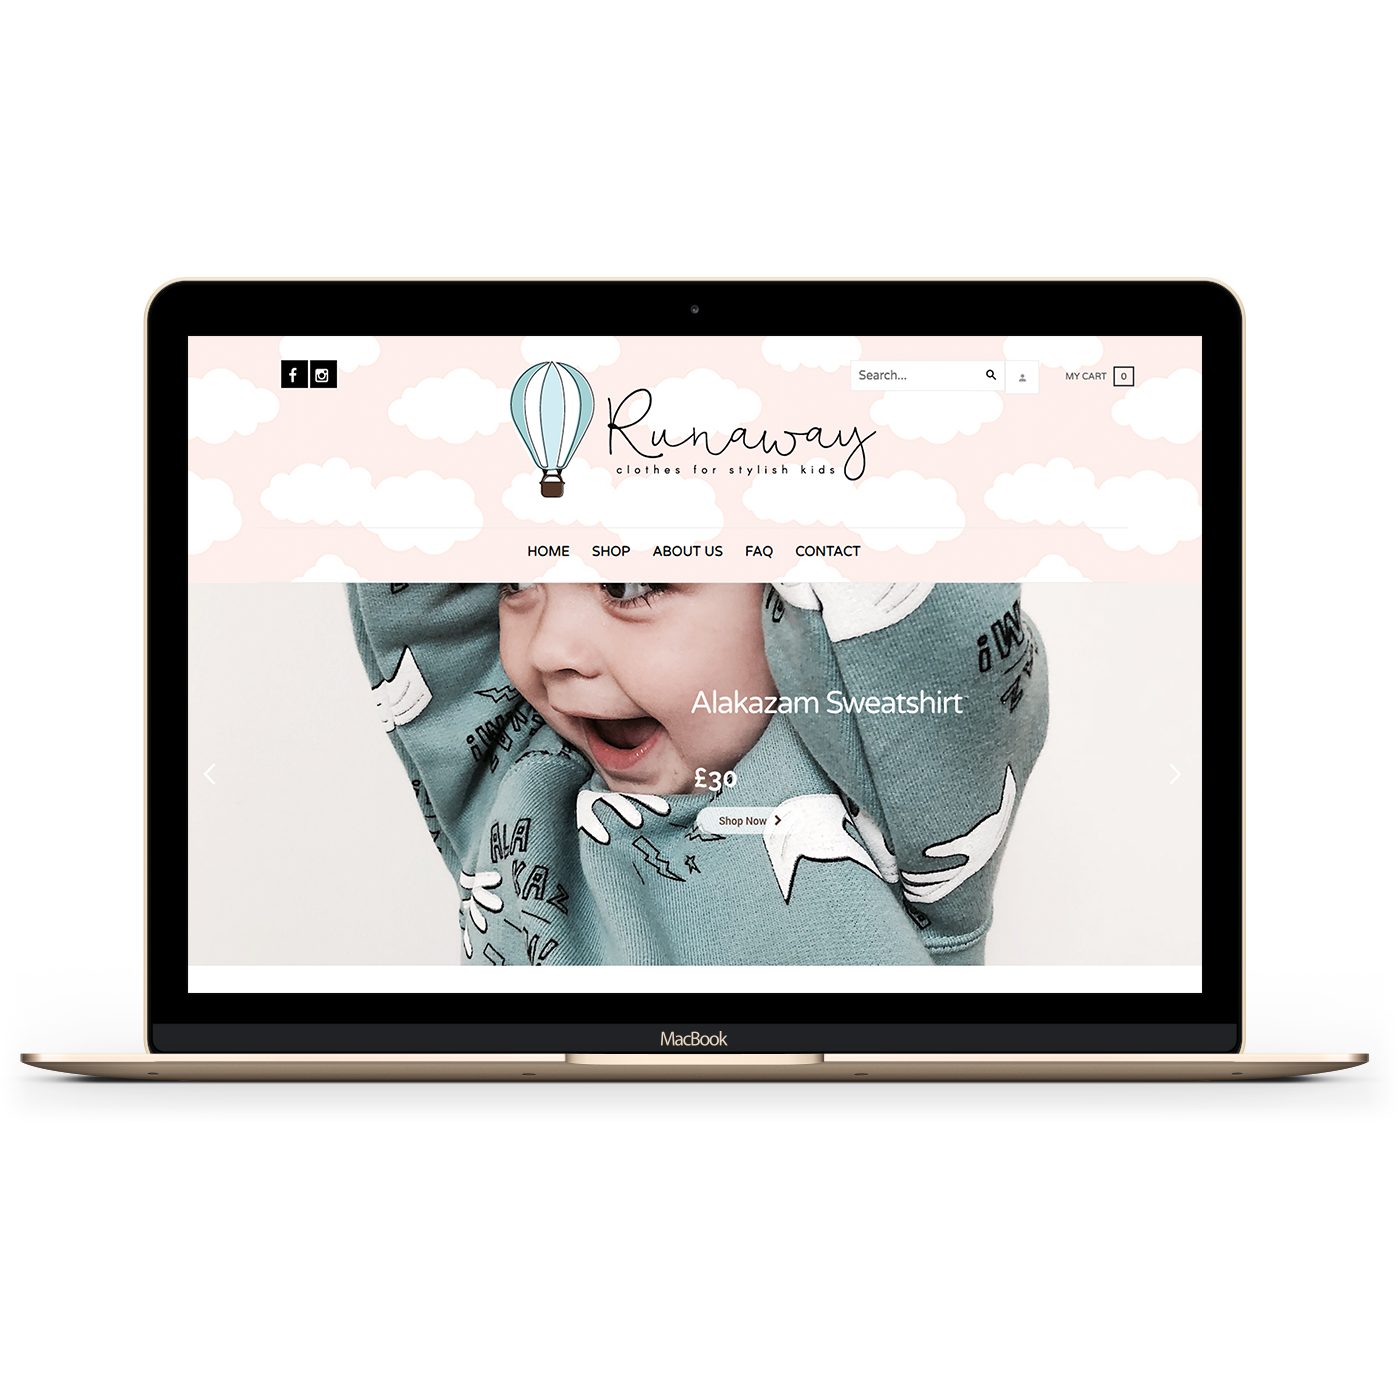 Runaway Retail website image